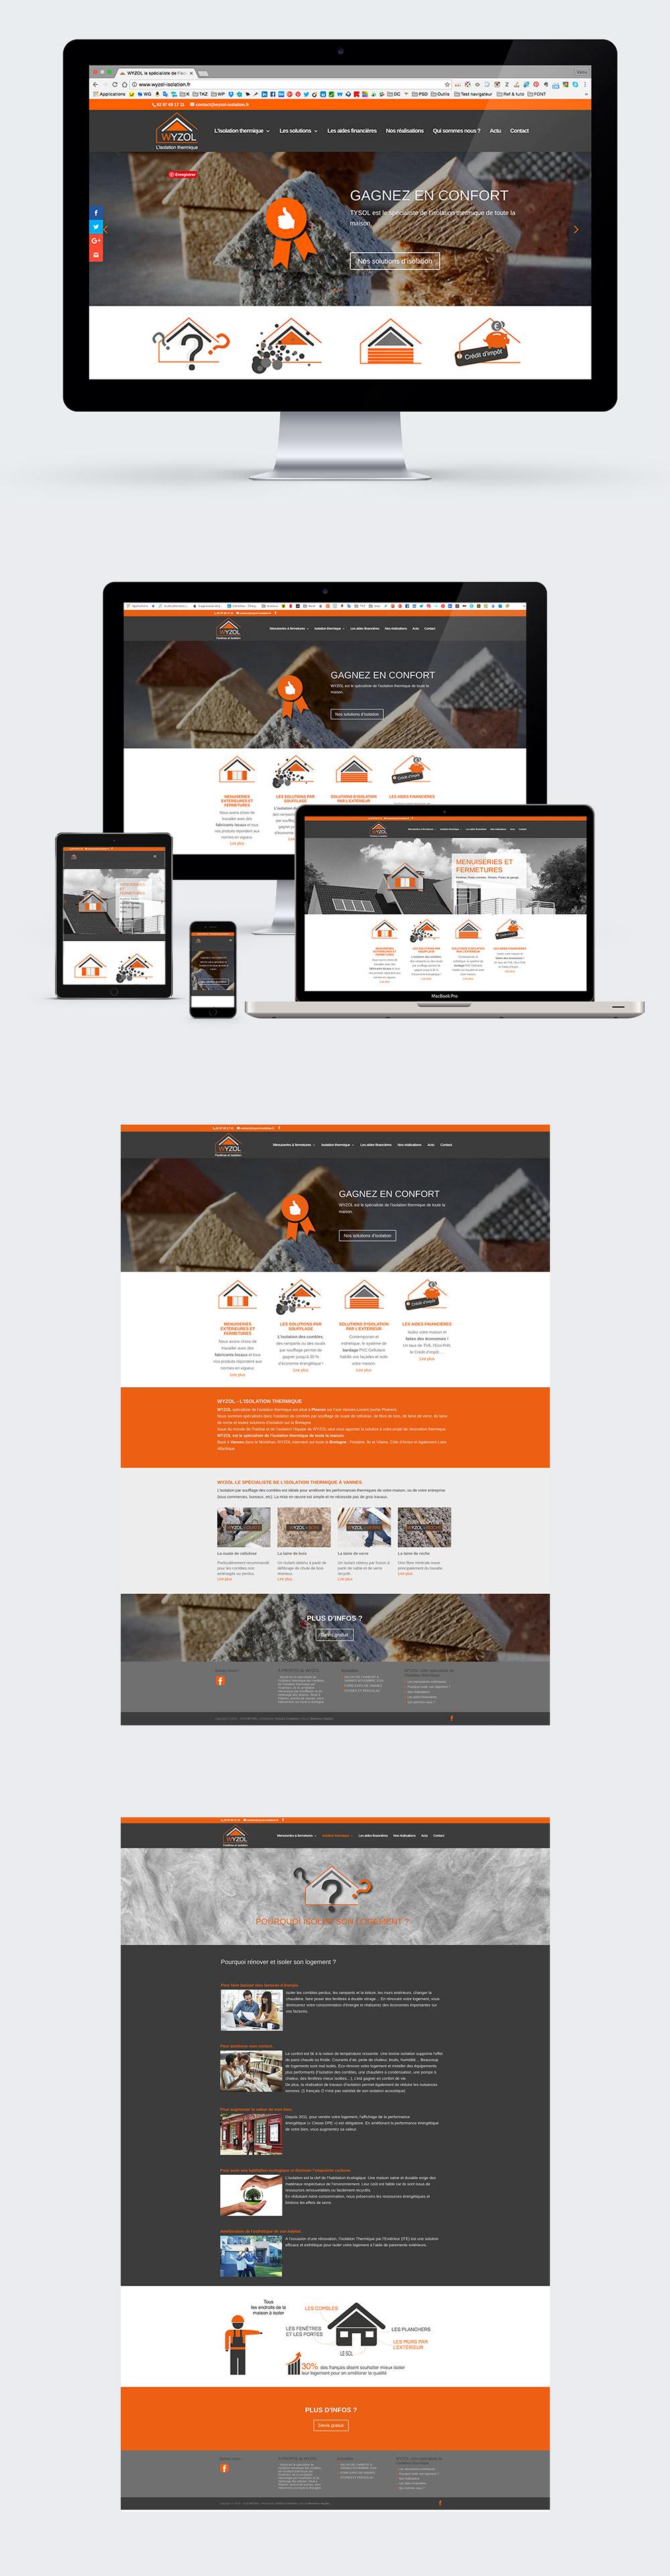 Webdesign - Wyzol - site internet réalisé par Turkoiz Créations by Valérie Perrodo